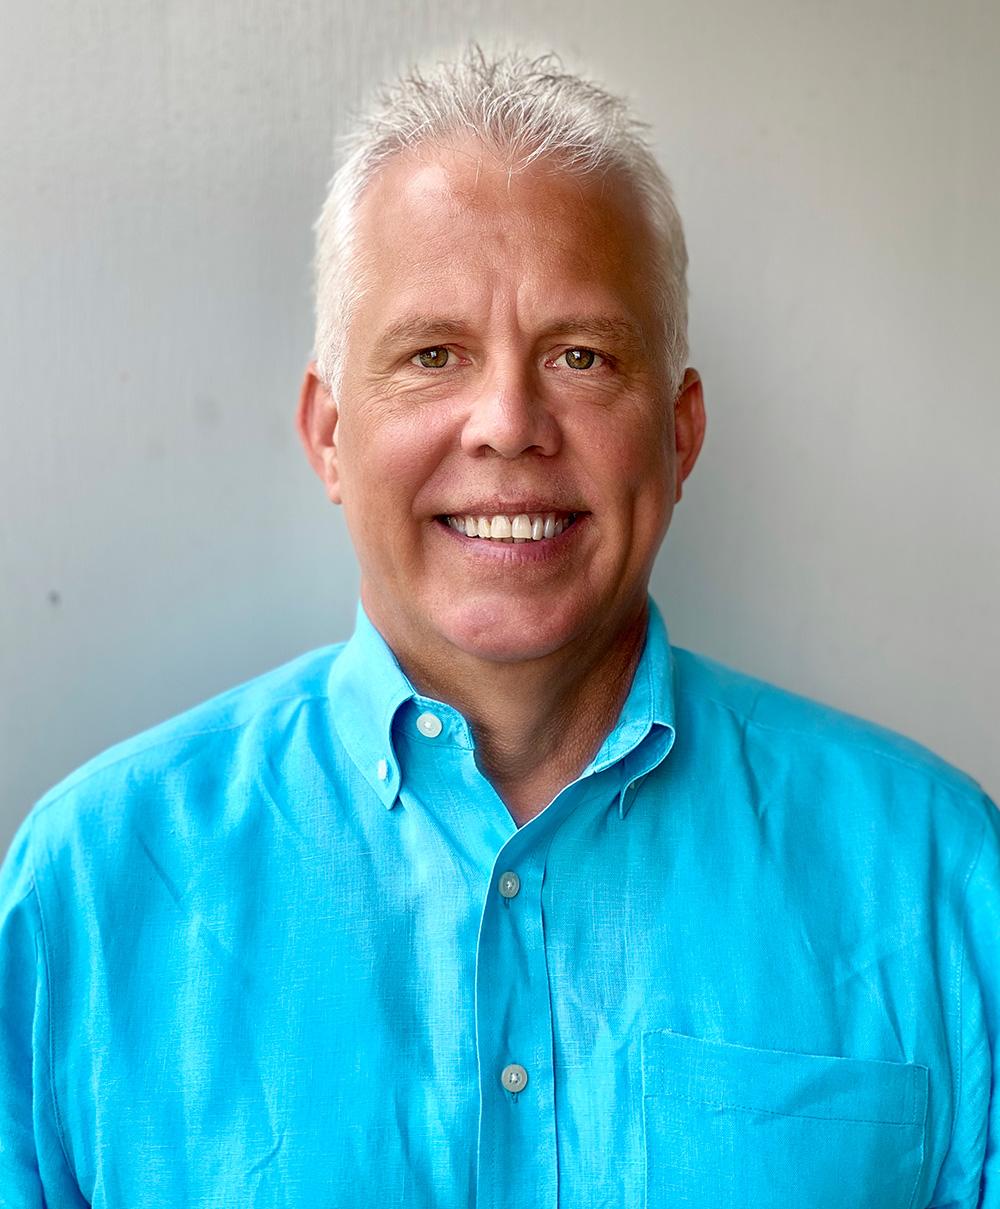 Profile picture of Neptune Society Office Coordinator, Glenn Mehrtens